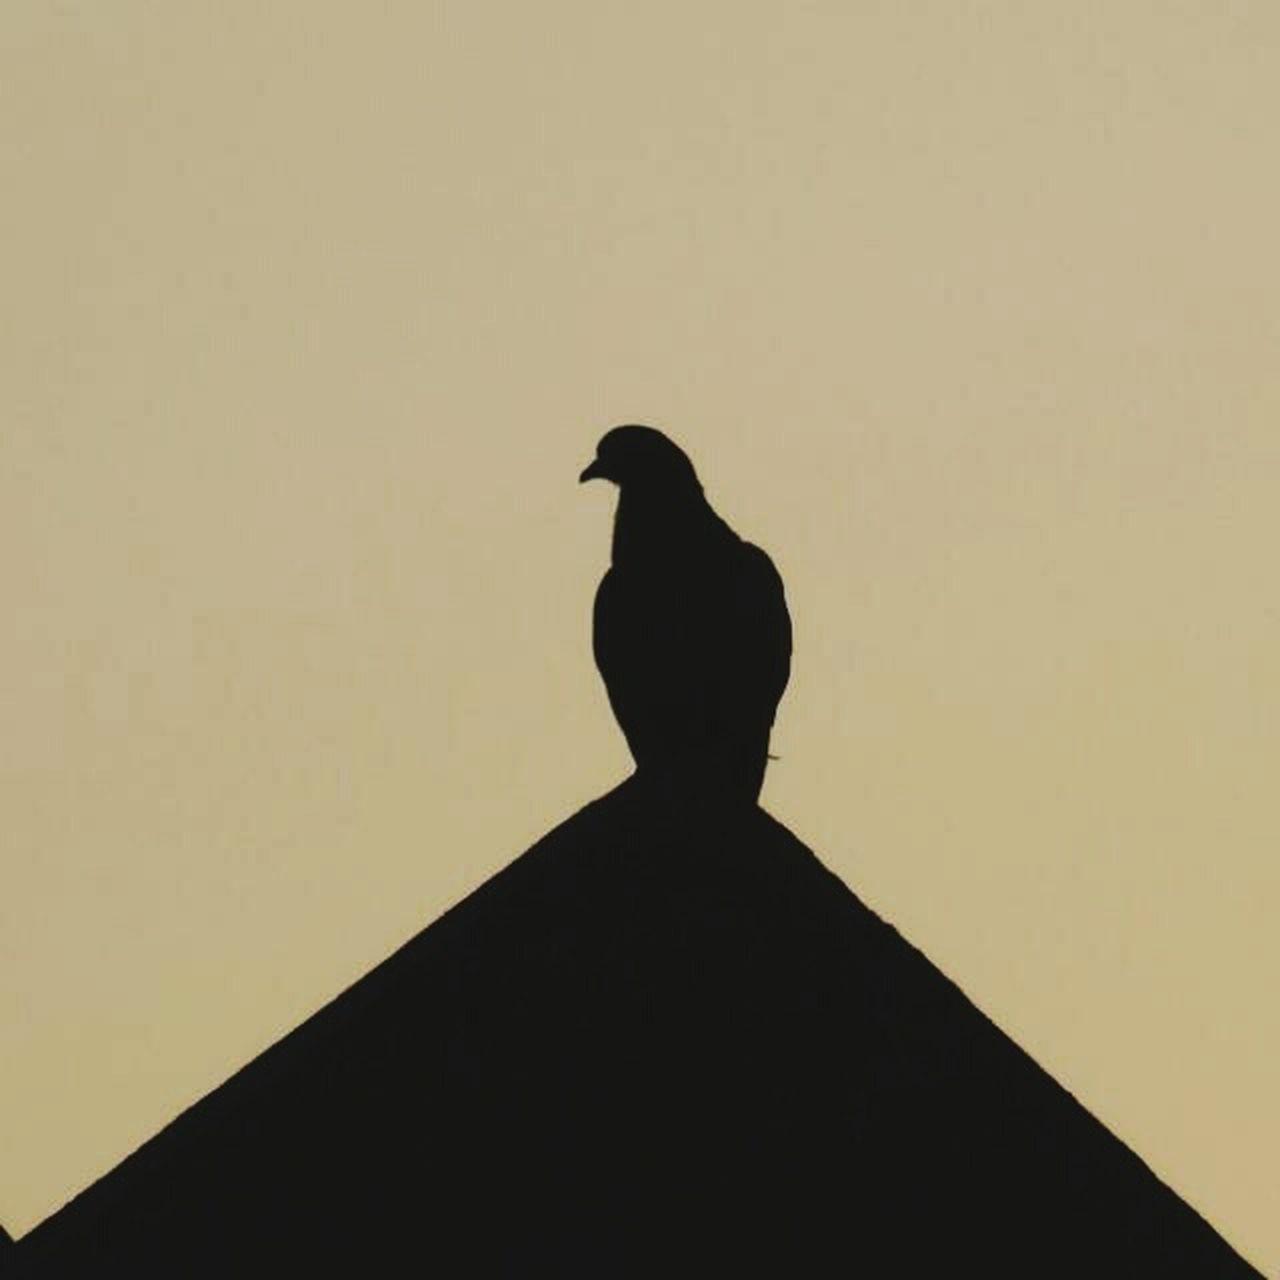 silhouette, bird, no people, animal themes, raven - bird, outdoors, perching, day, sky